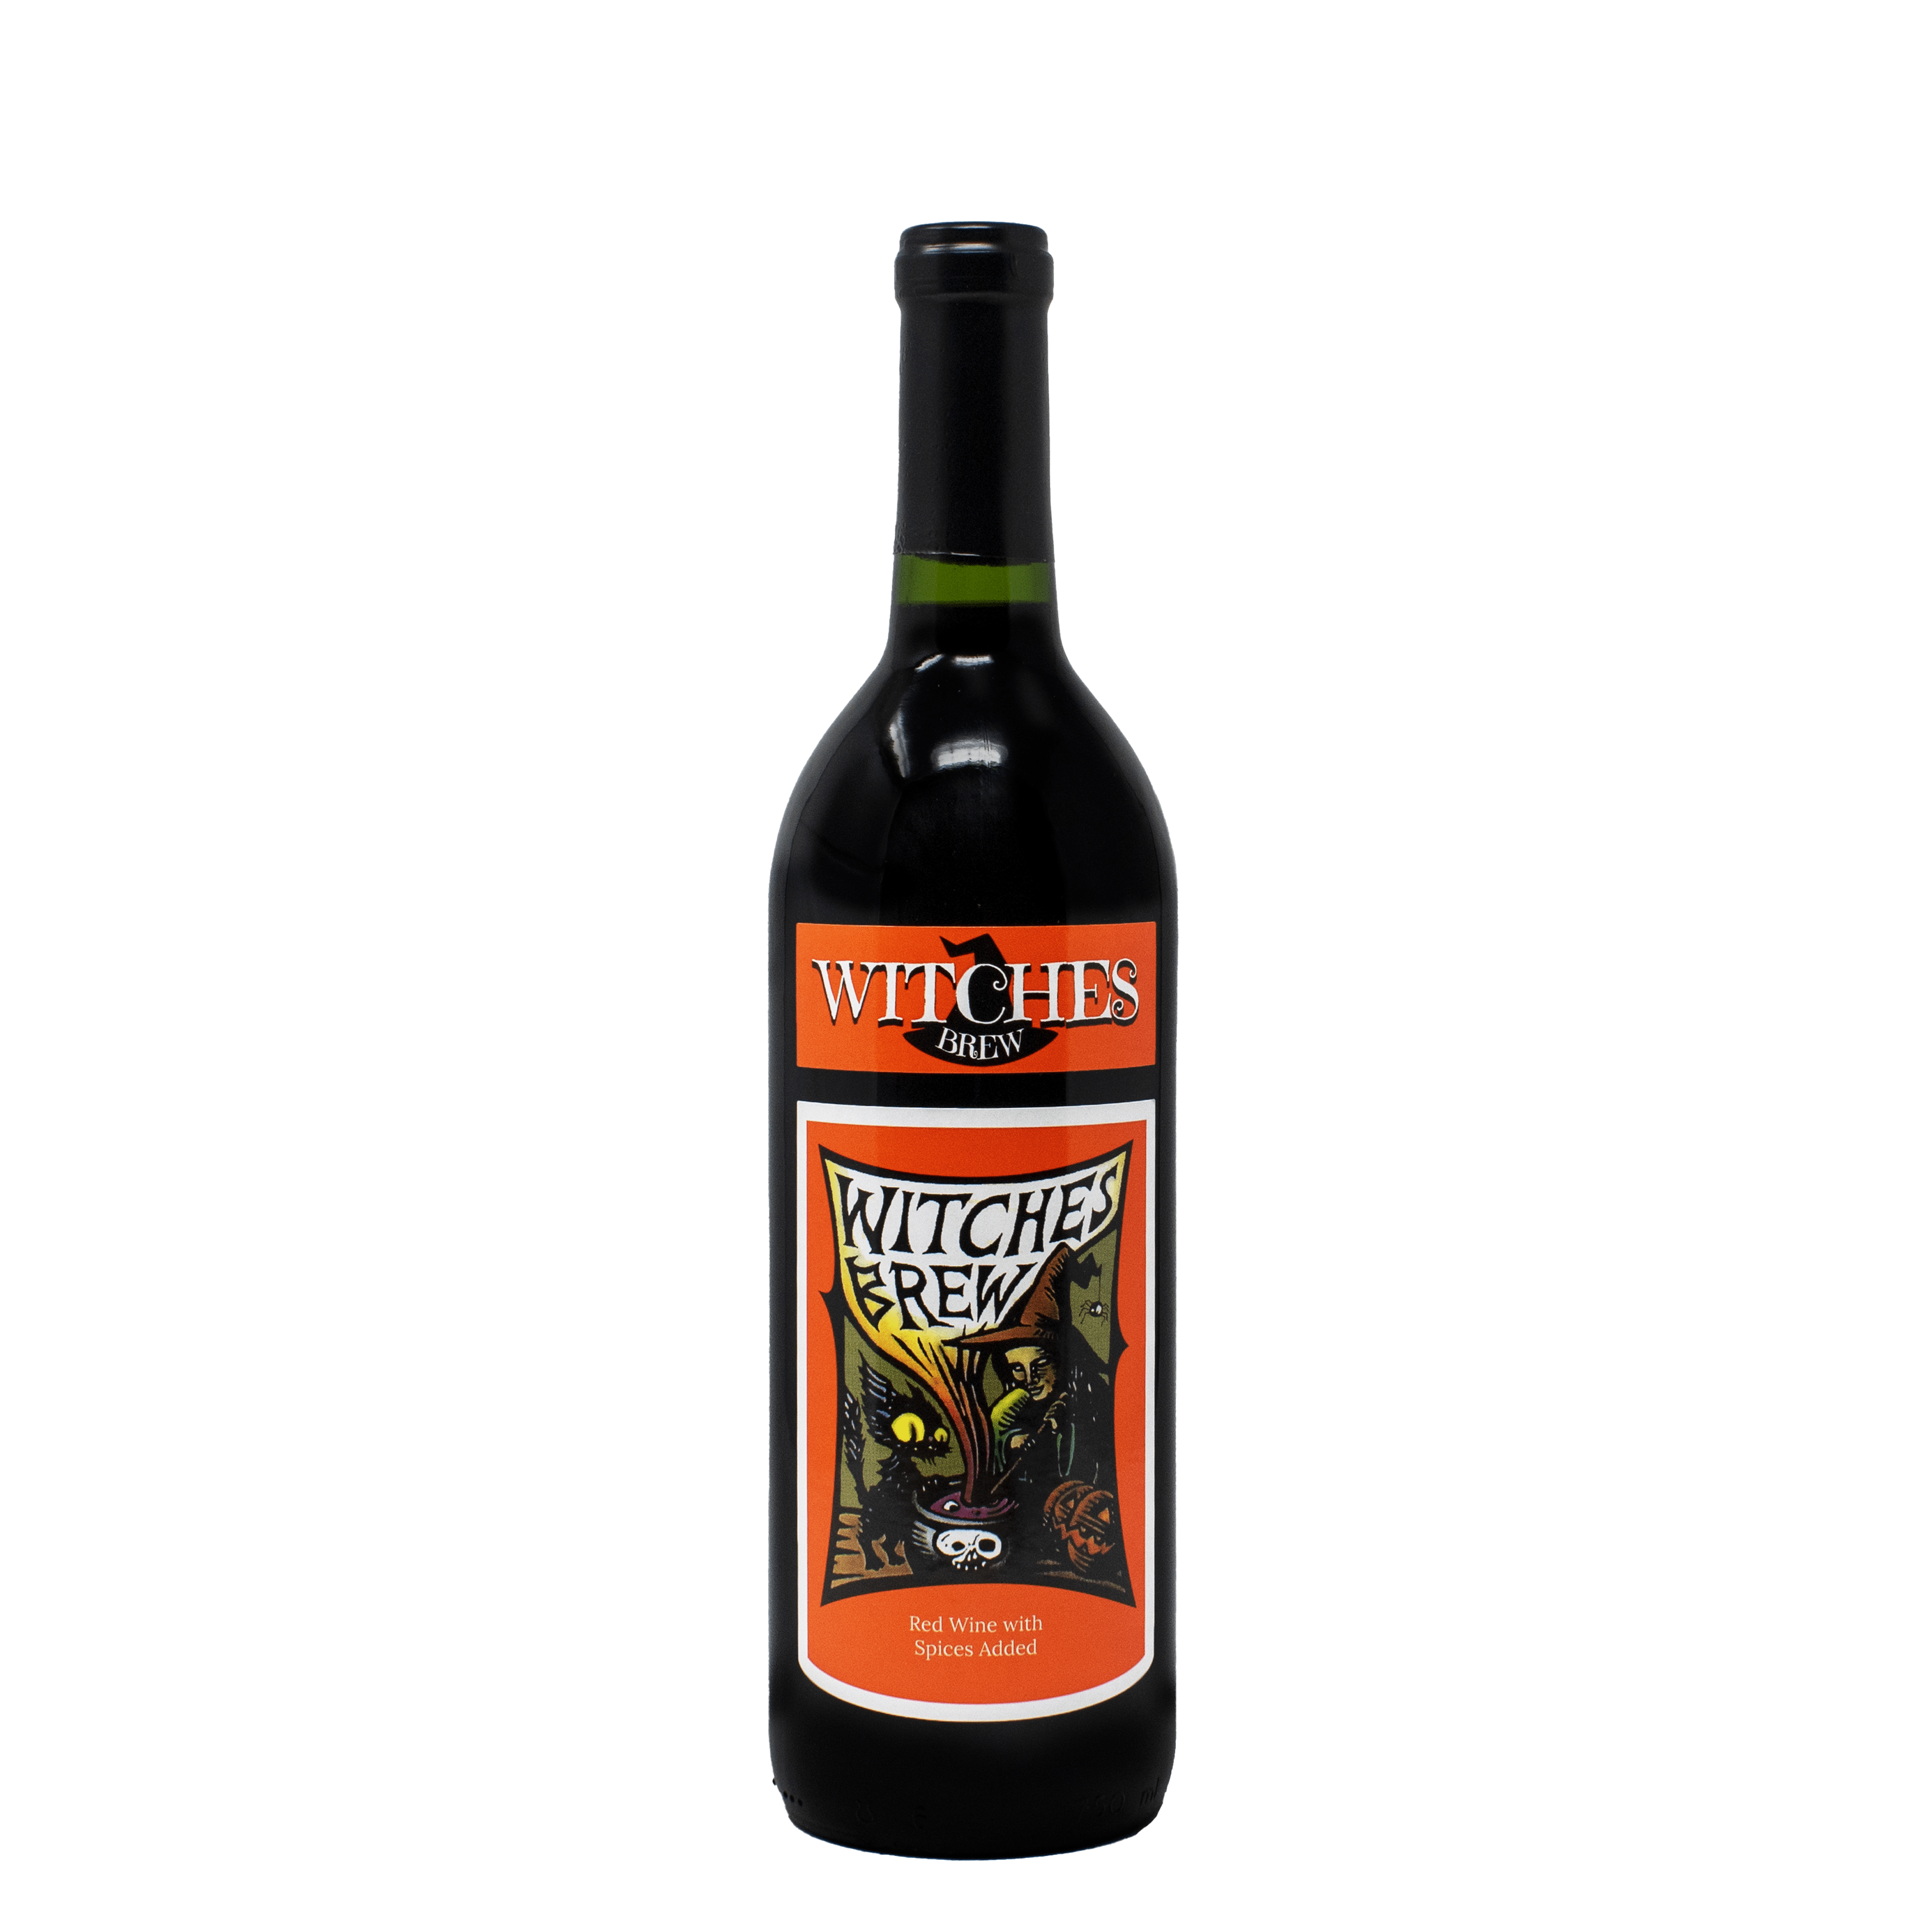 Witches Brew Wine